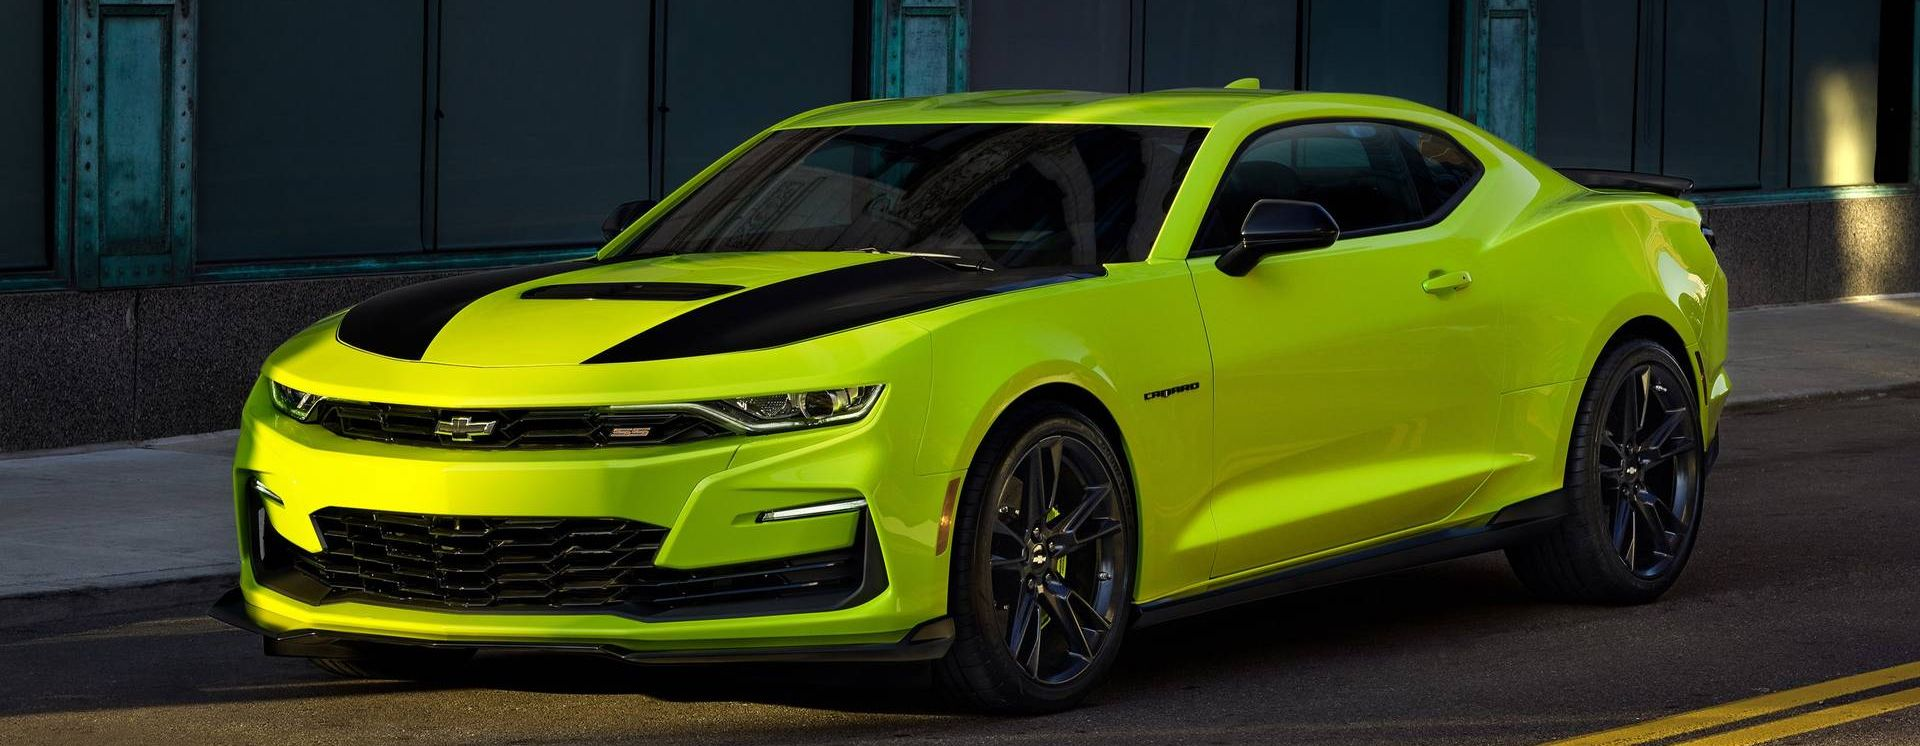 2019 Chevrolet Camaro Financing near Merrillville, IN